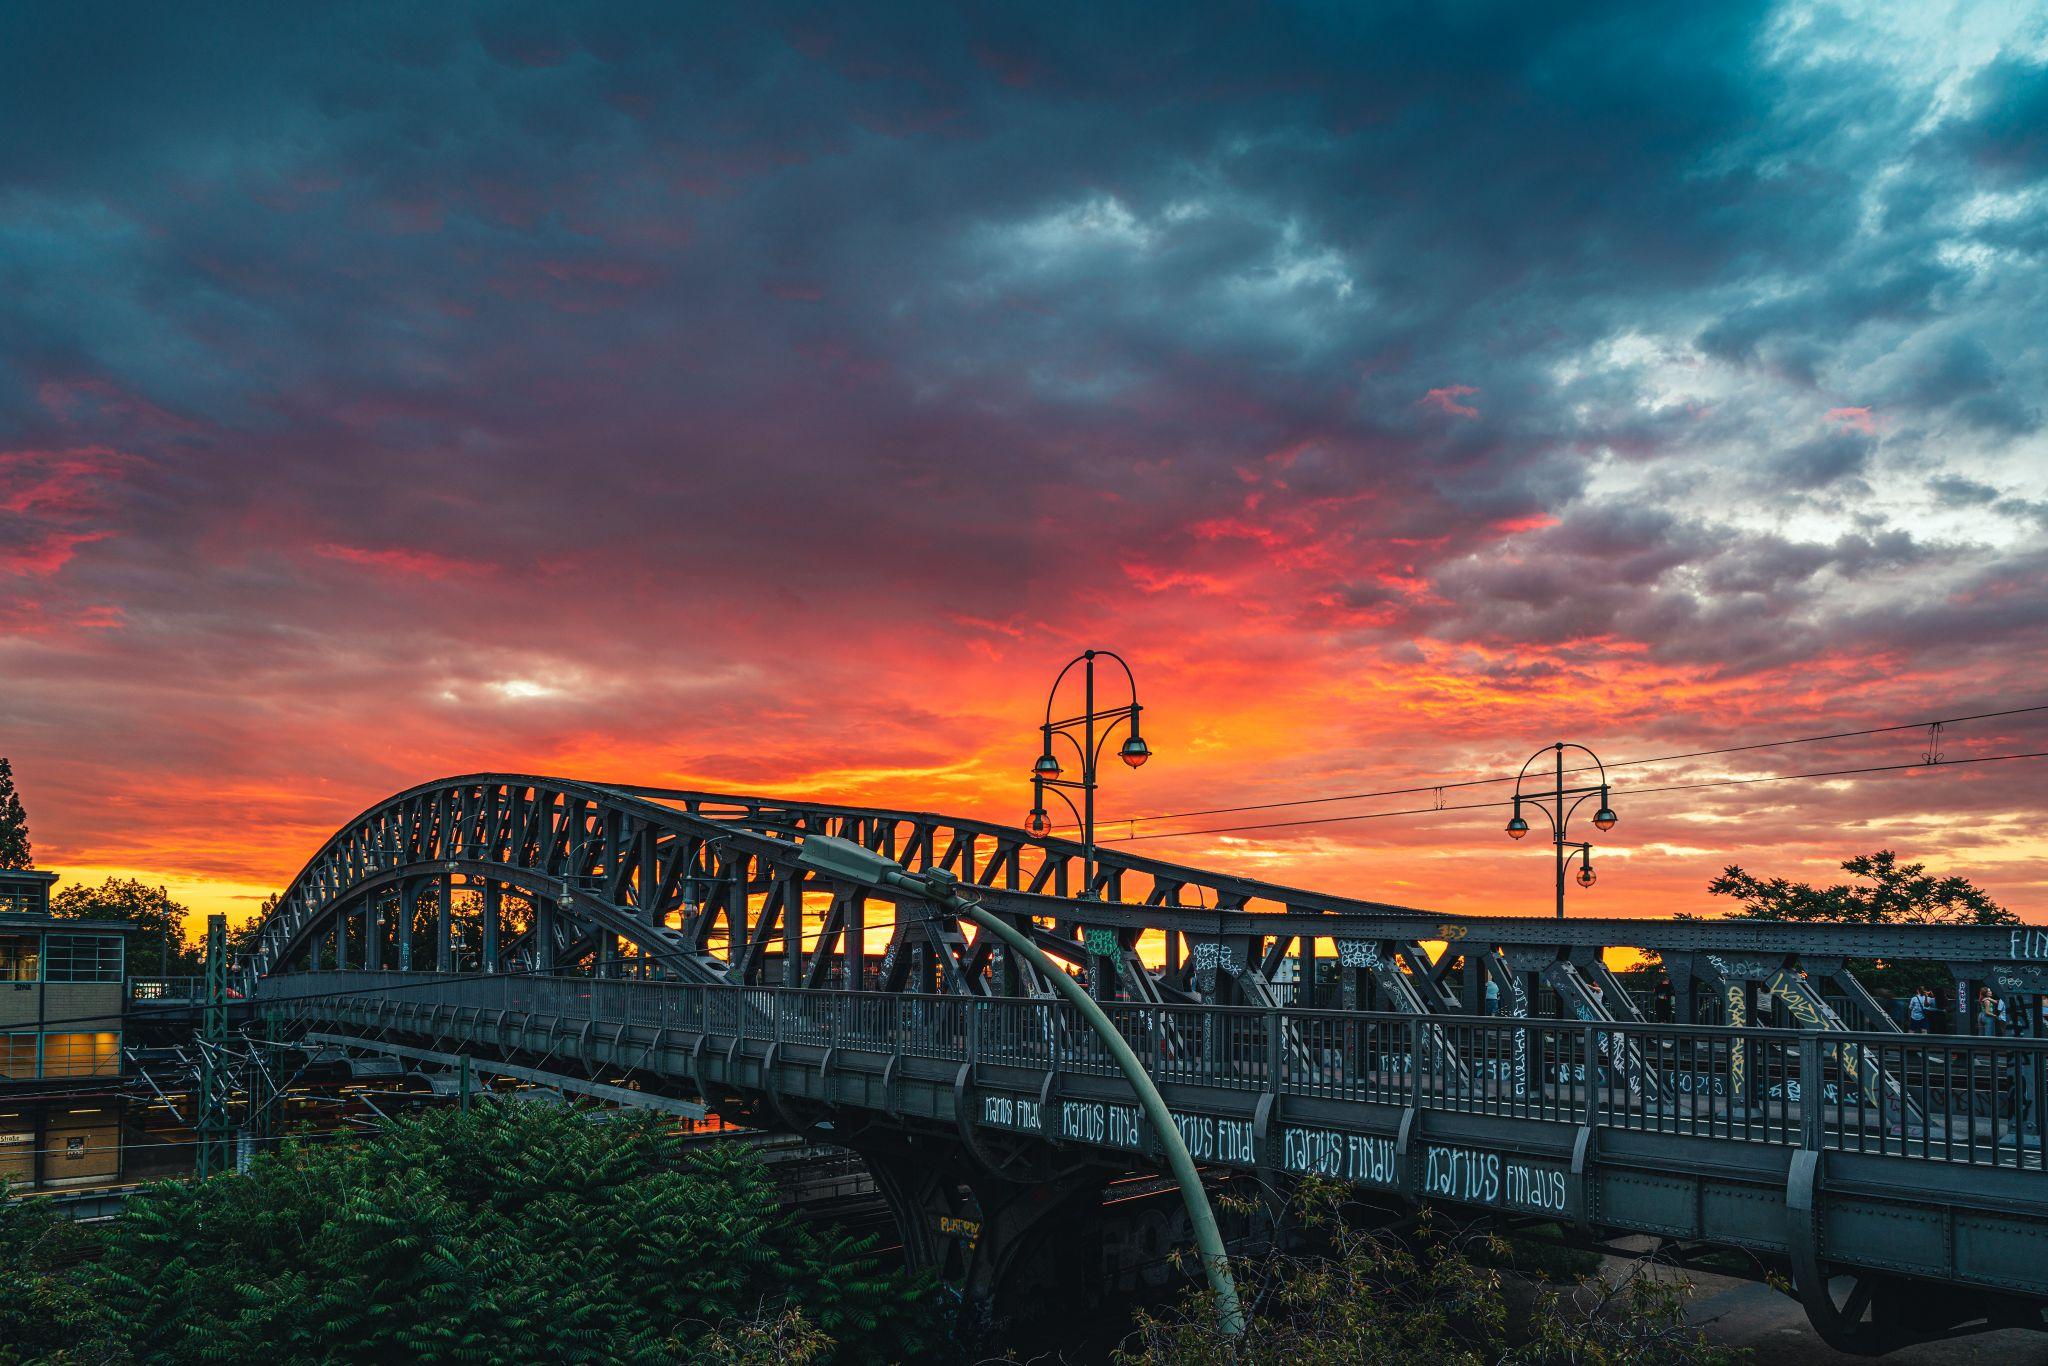 Bösebrücke, Germany